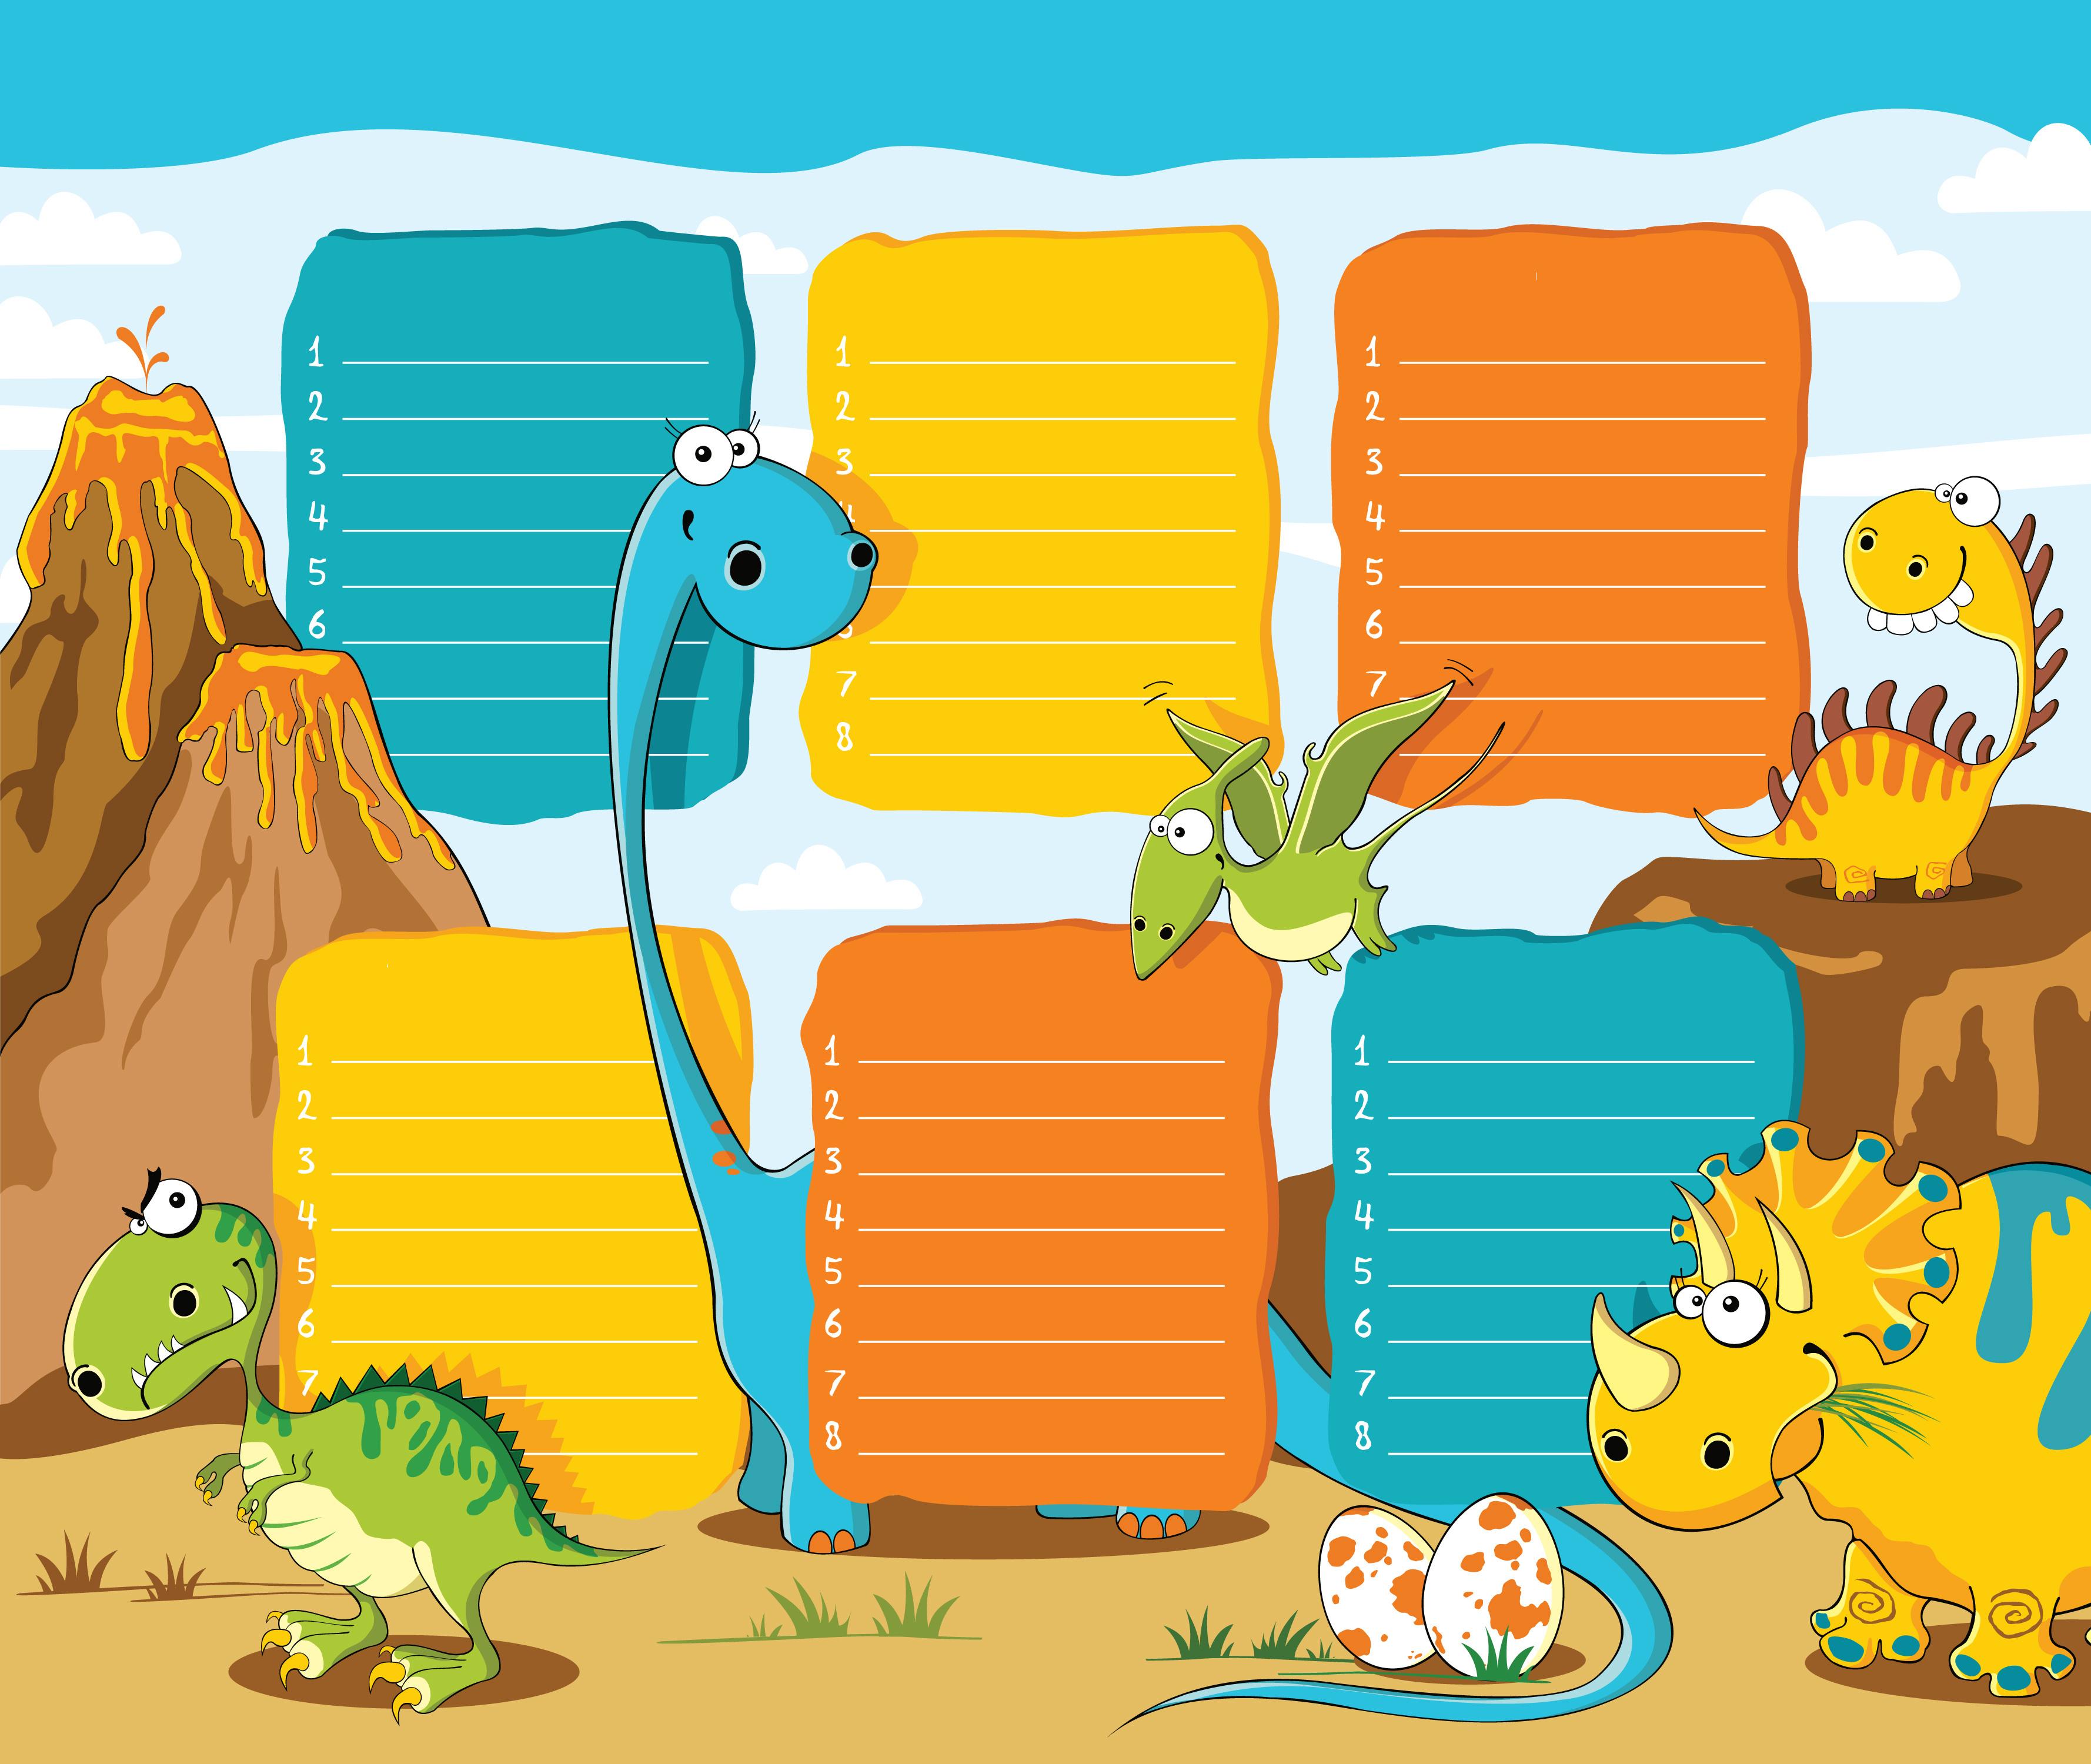 horario-dinosaurios-mudo